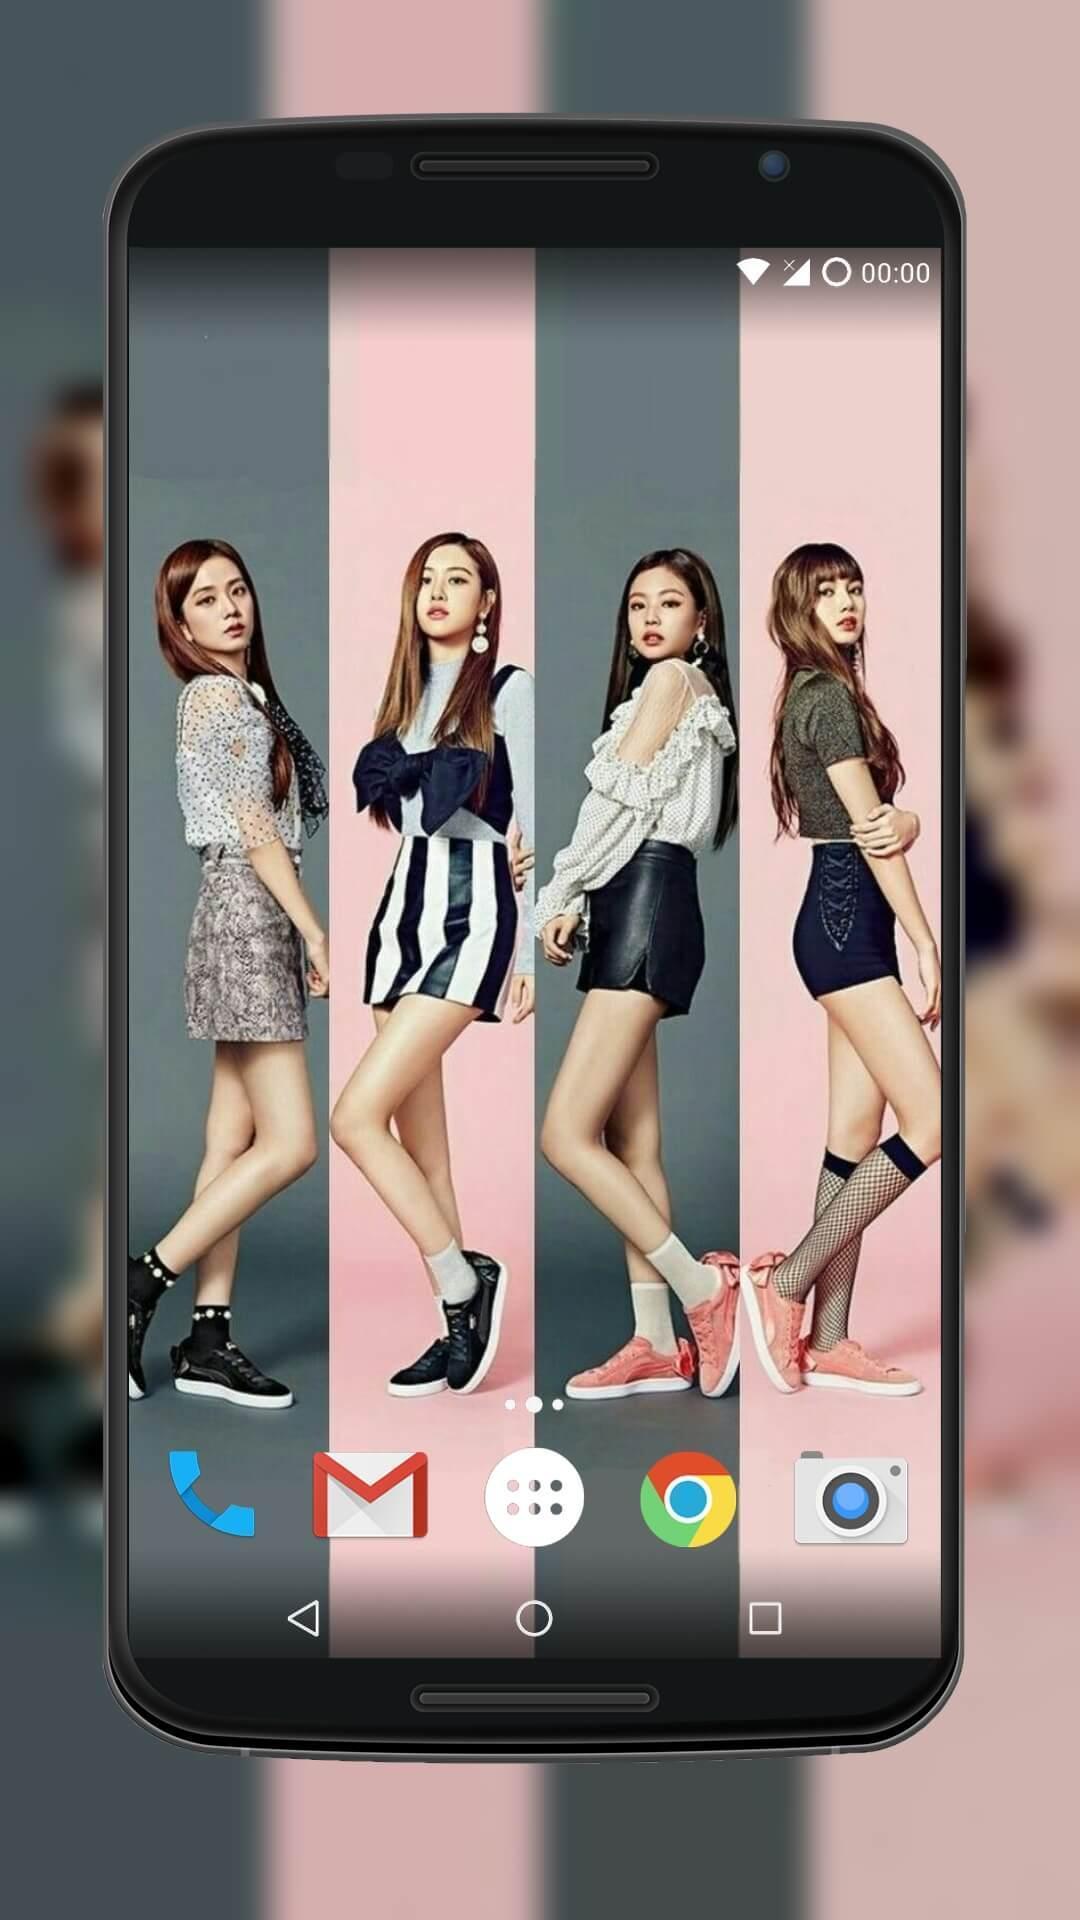 Blackpink Wallpaper 2020 Jisoo Jennie Rose Lisa For Android Apk Download